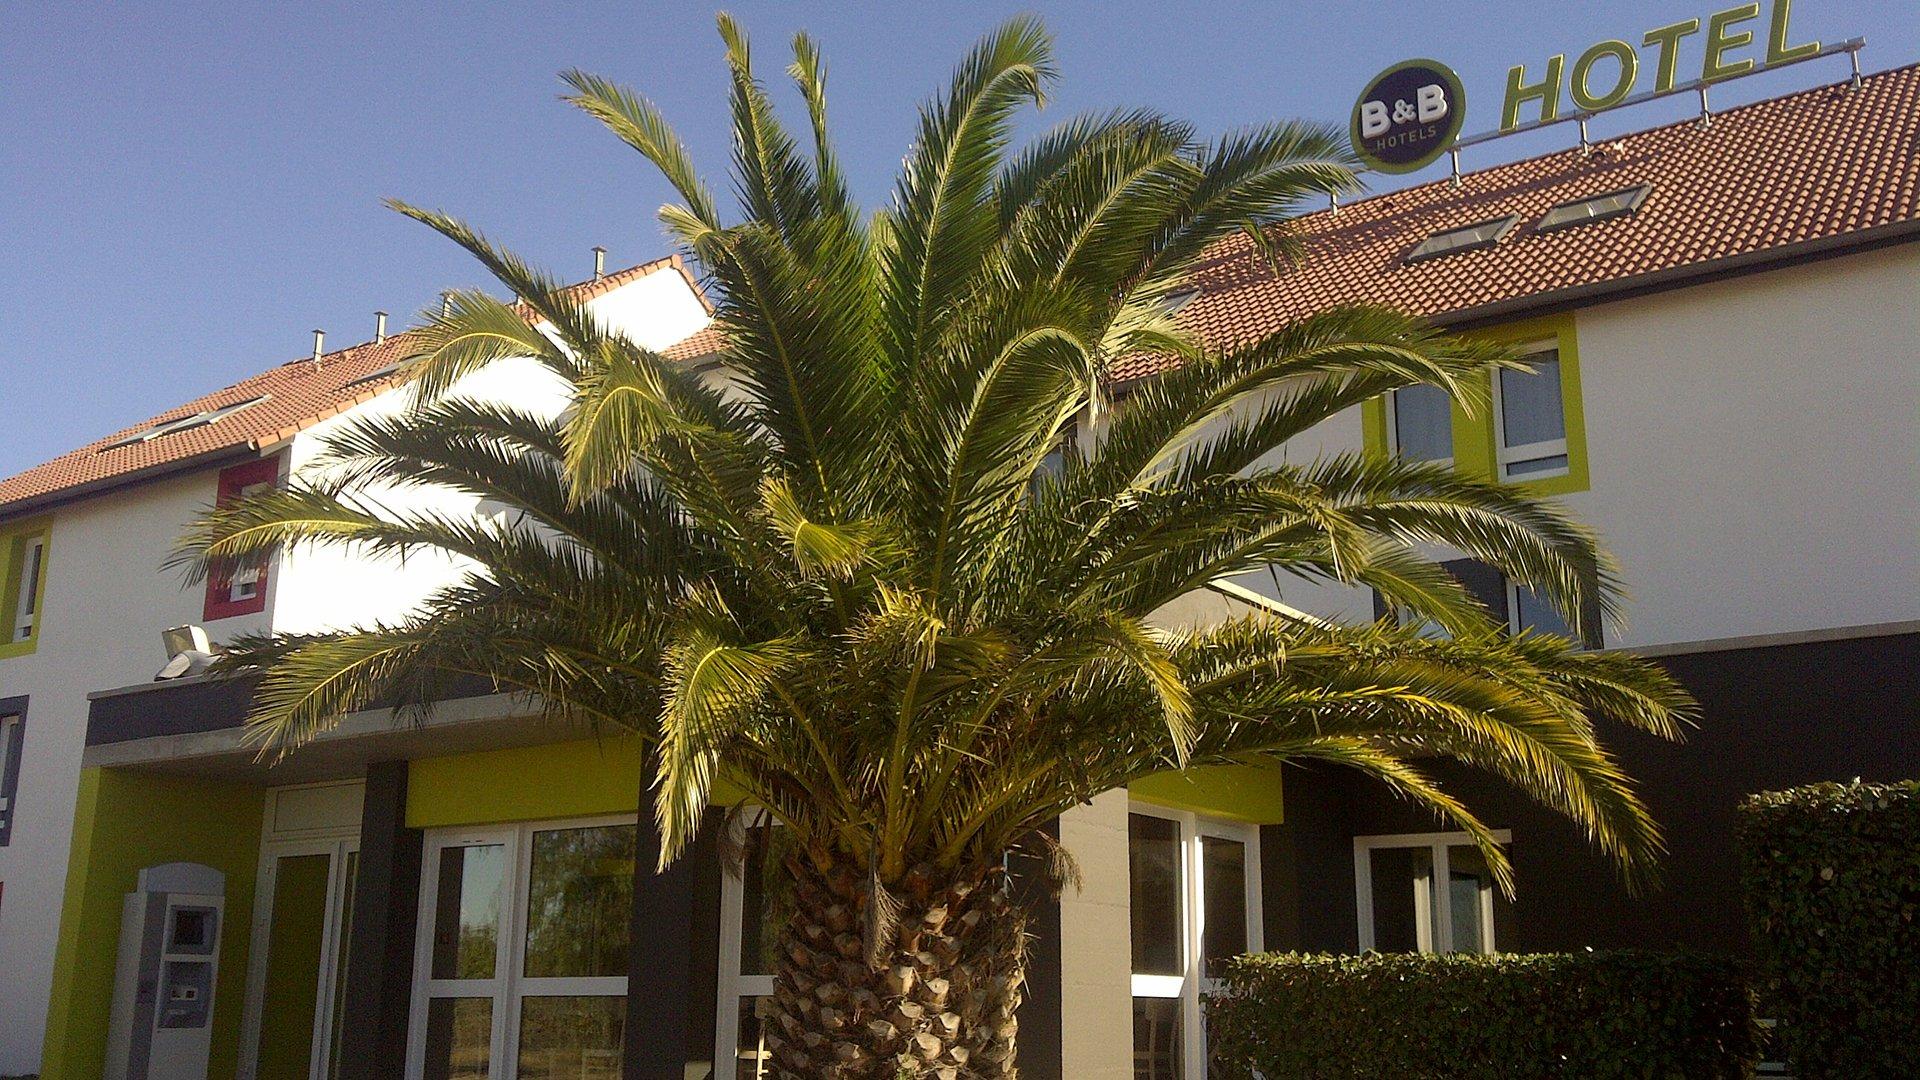 B&B Hotel Perpignan Nord